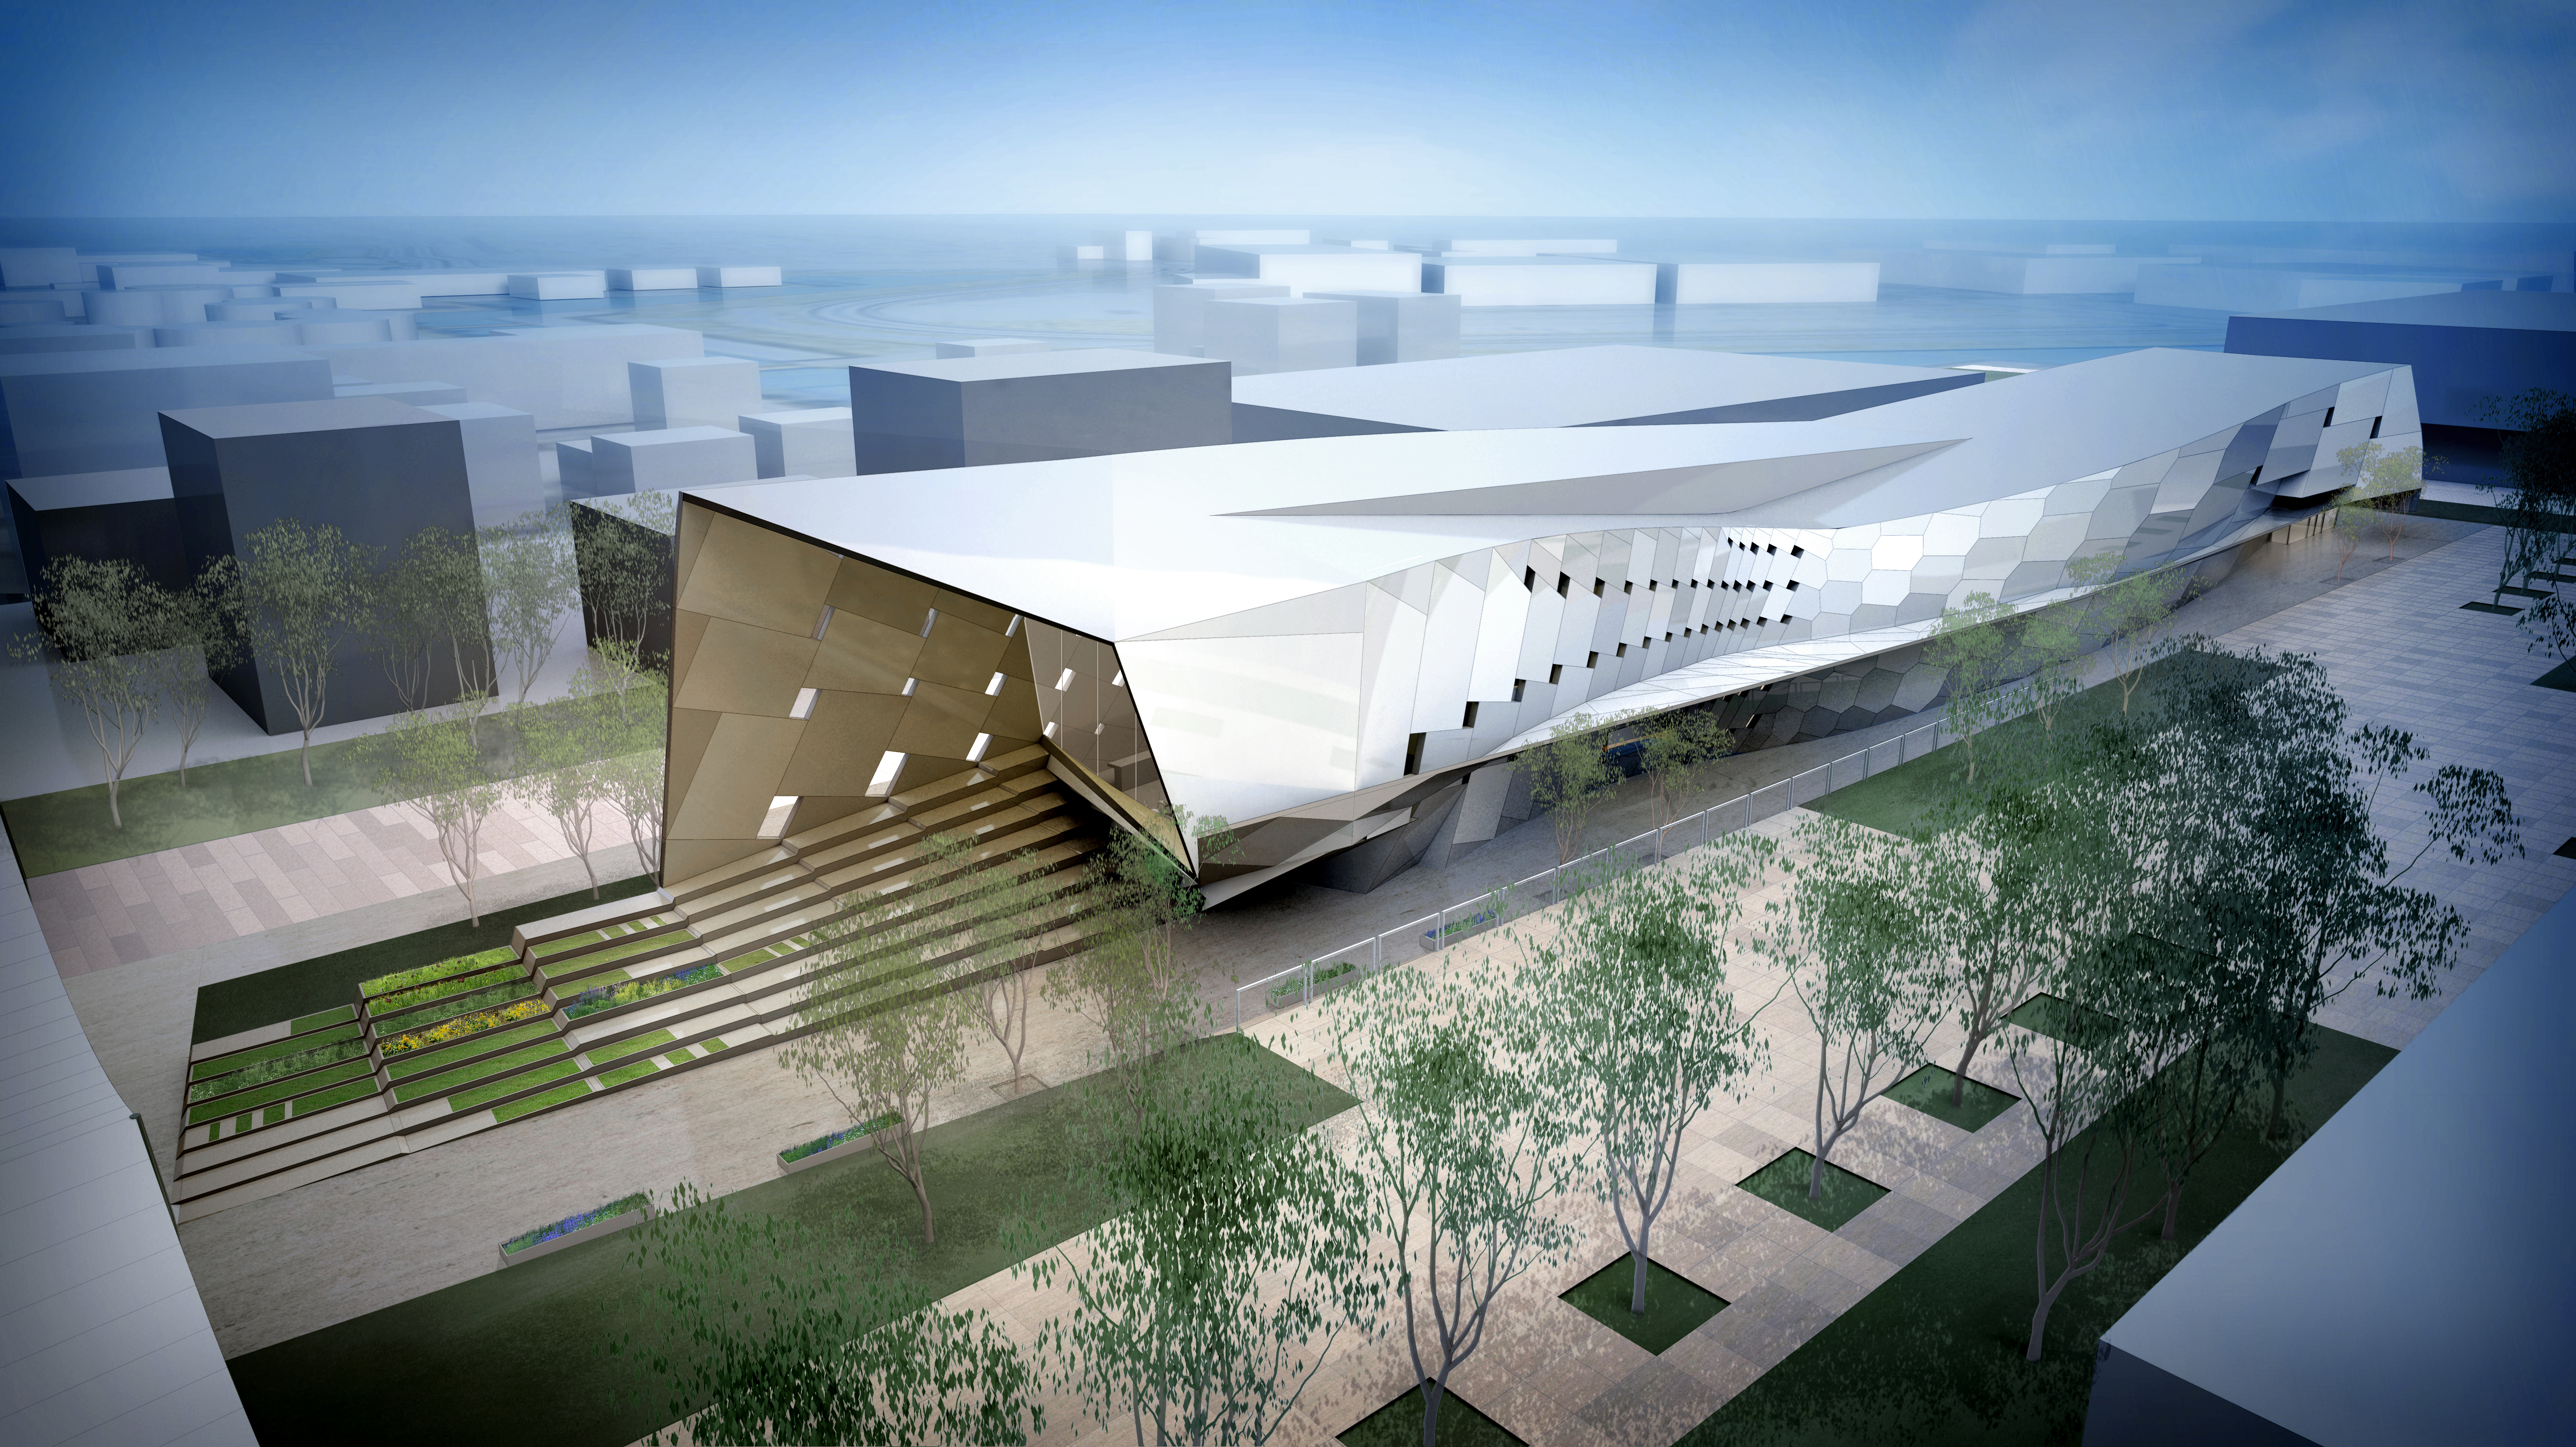 Israel Pavilion - Expo 2015, Milan